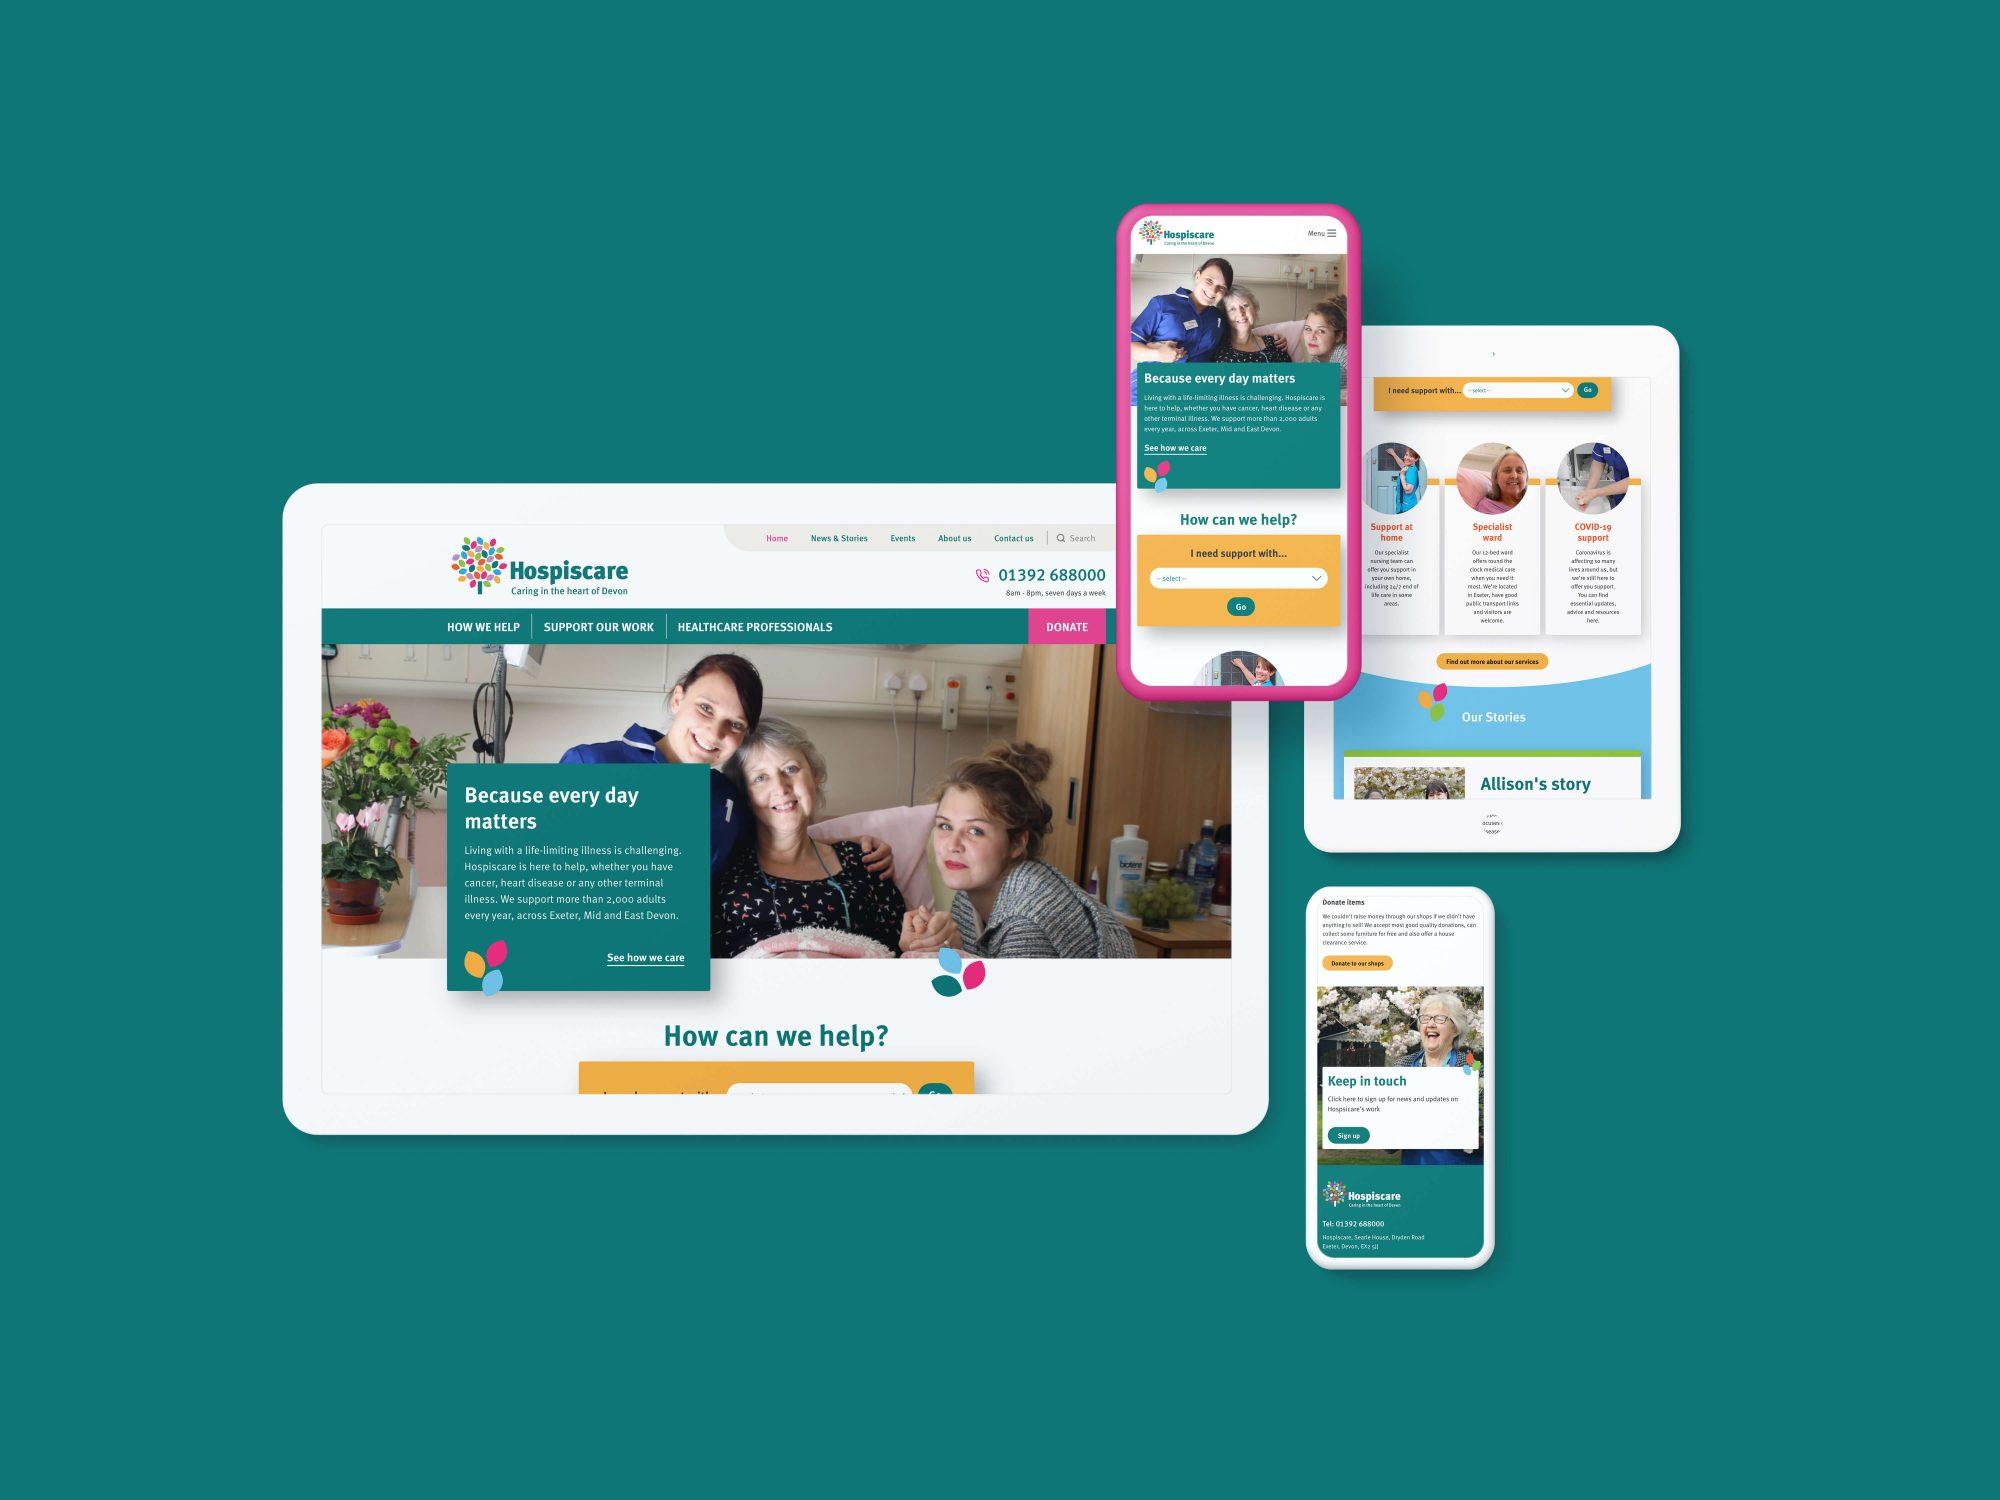 Hospiscare website design shown on devices